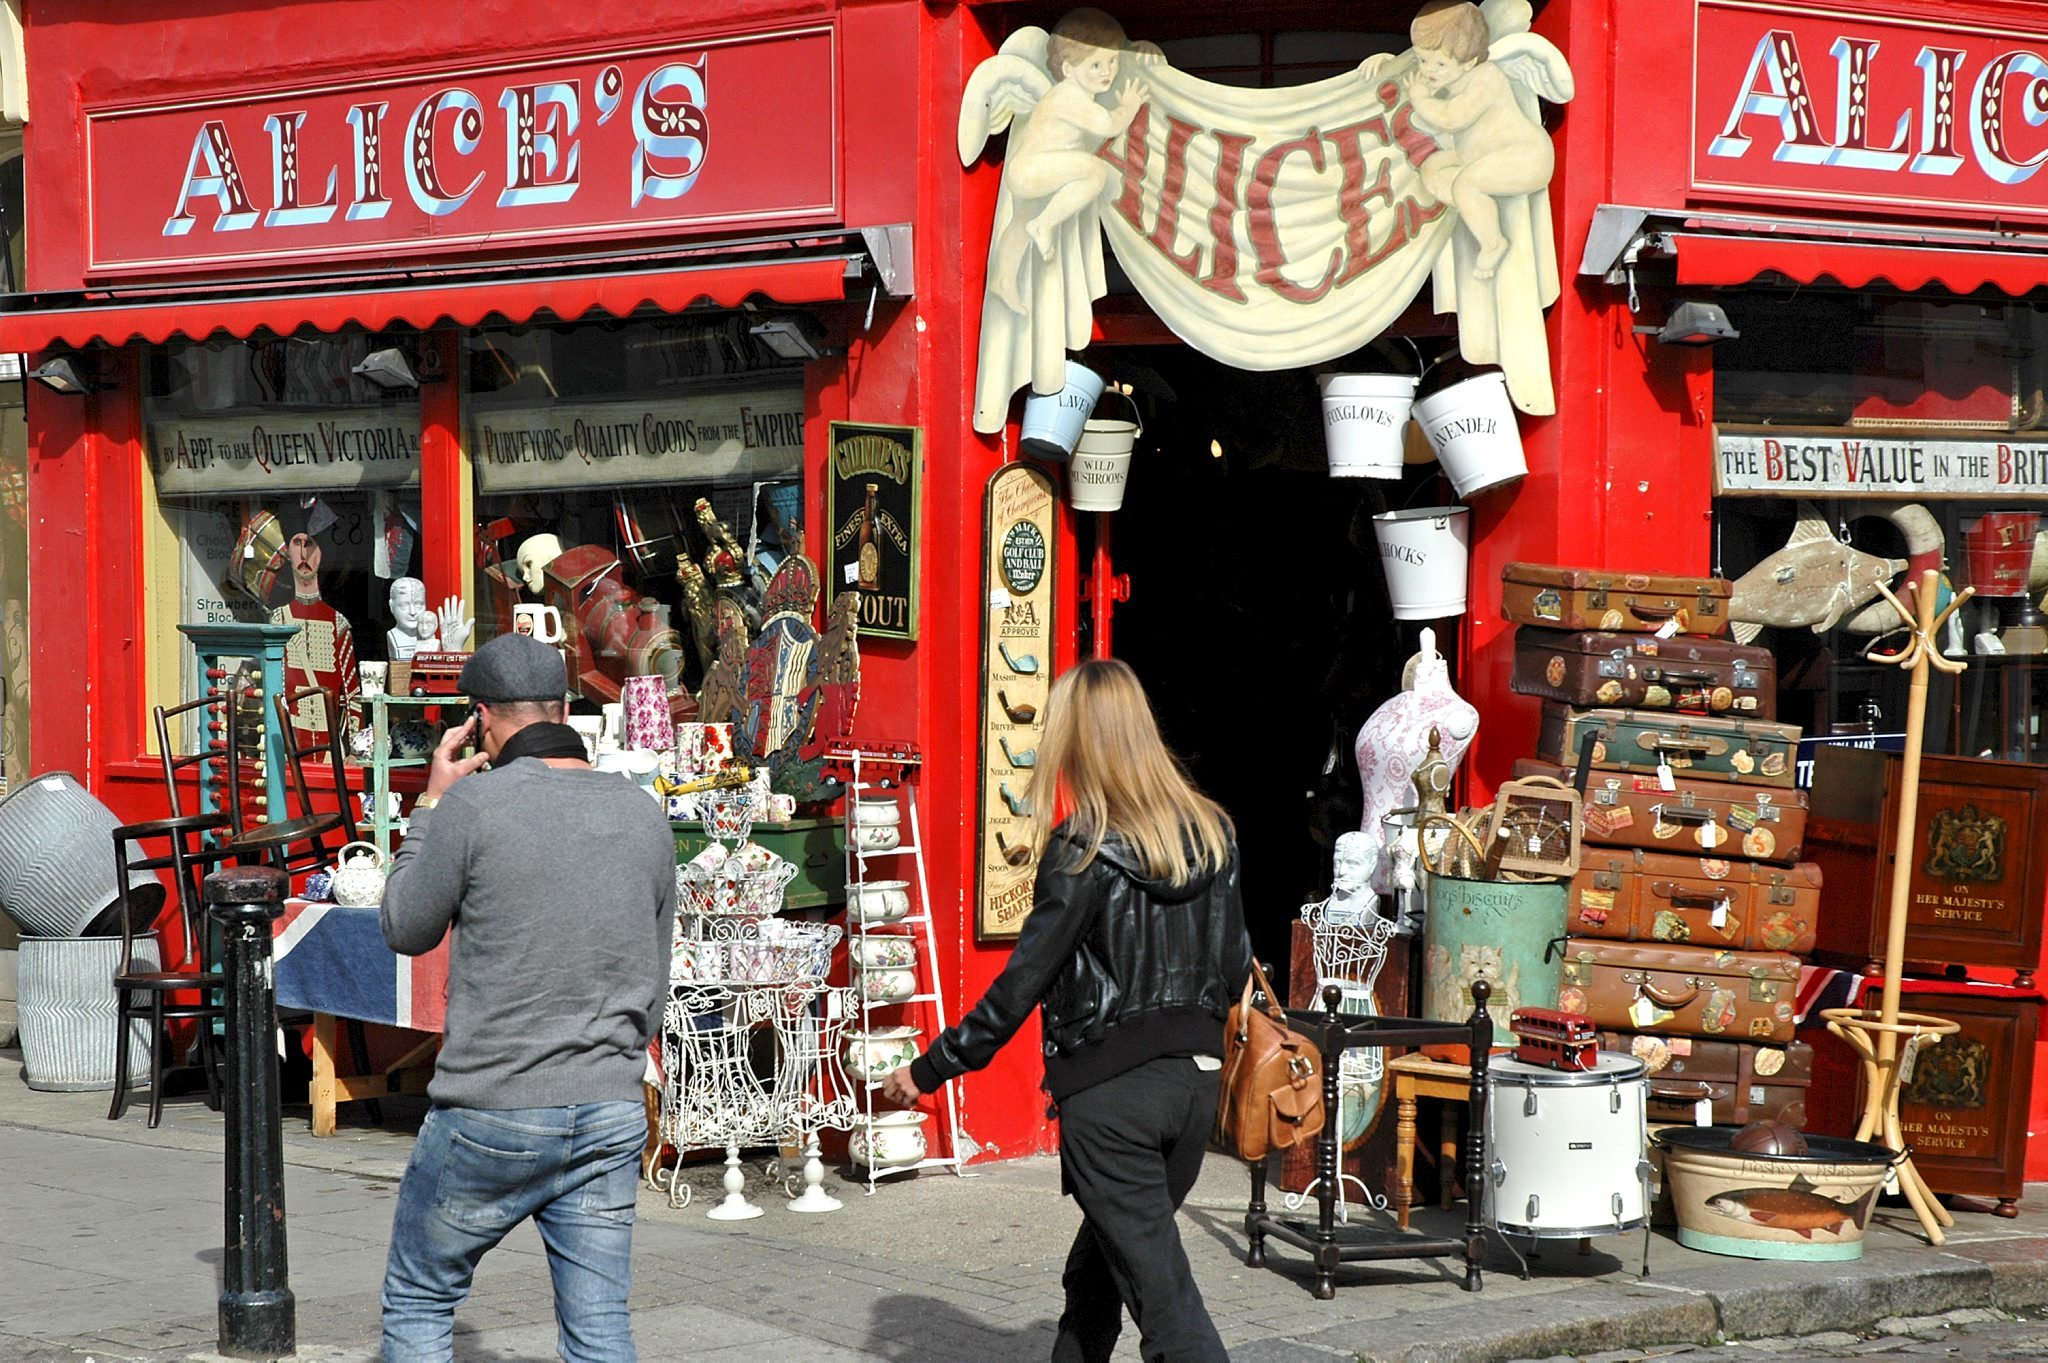 Browse Portobello Road Market and Notting Hill